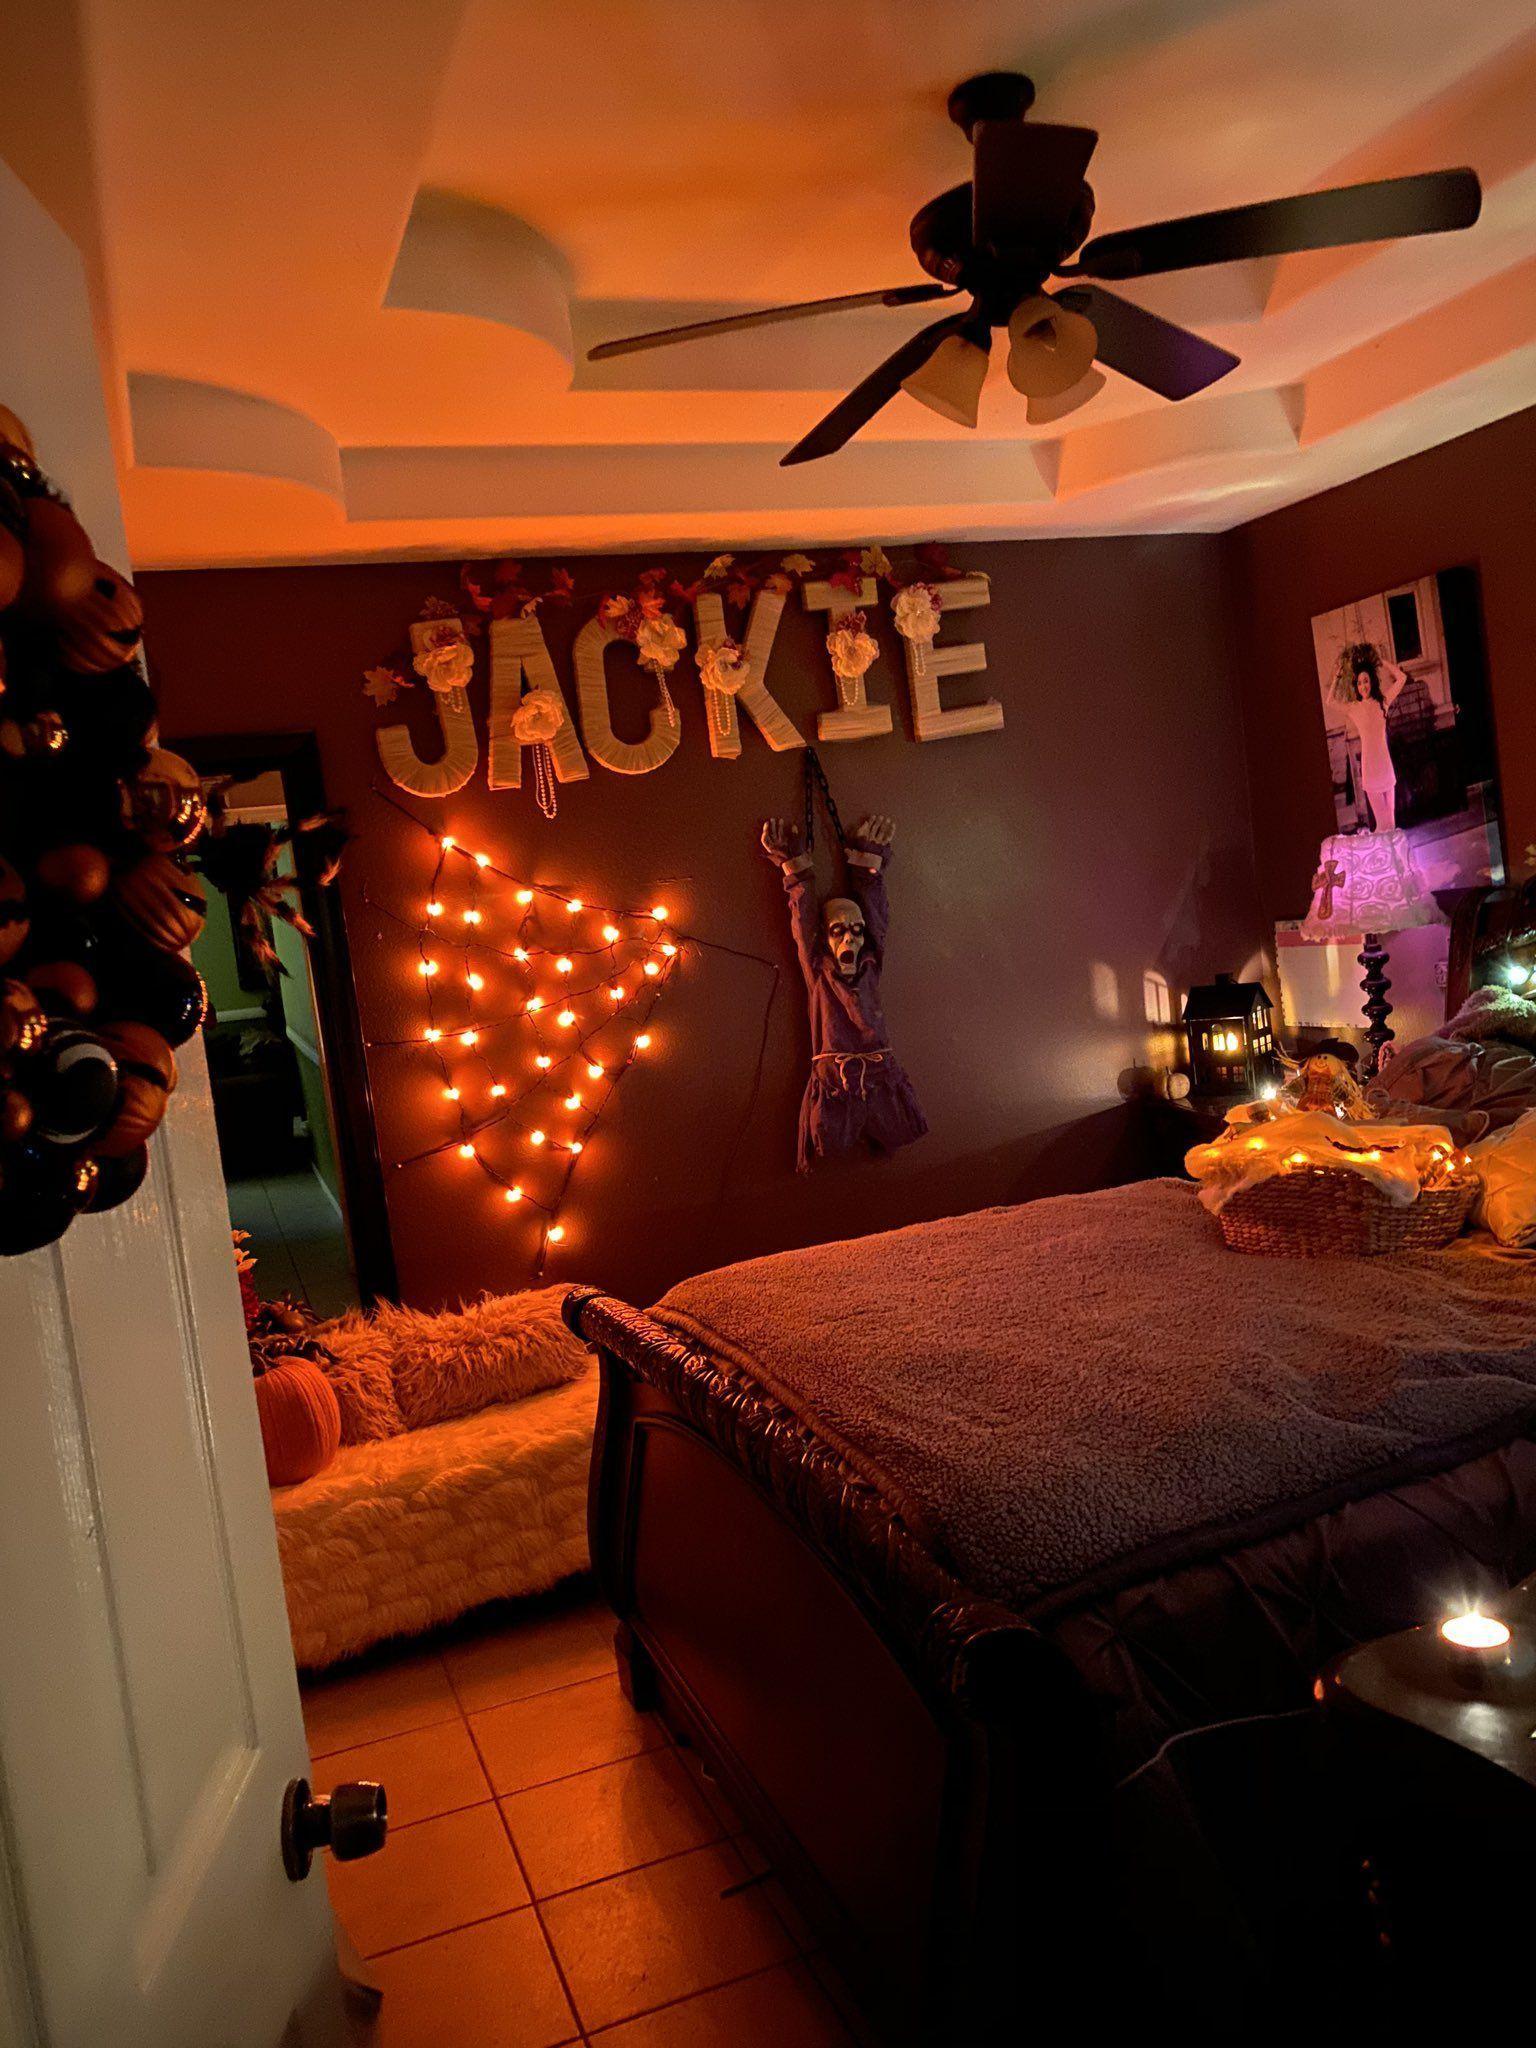 j a c k i e on #spookybasket j a c k i e on Twitter: I got my spooky basket & even got a spooky room, all thanks to my BOO #spookybasket j a c k i e on #spookybasket j a c k i e on Twitter: I got my spooky basket & even got a spooky room, all thanks to my BOO #spookybasket